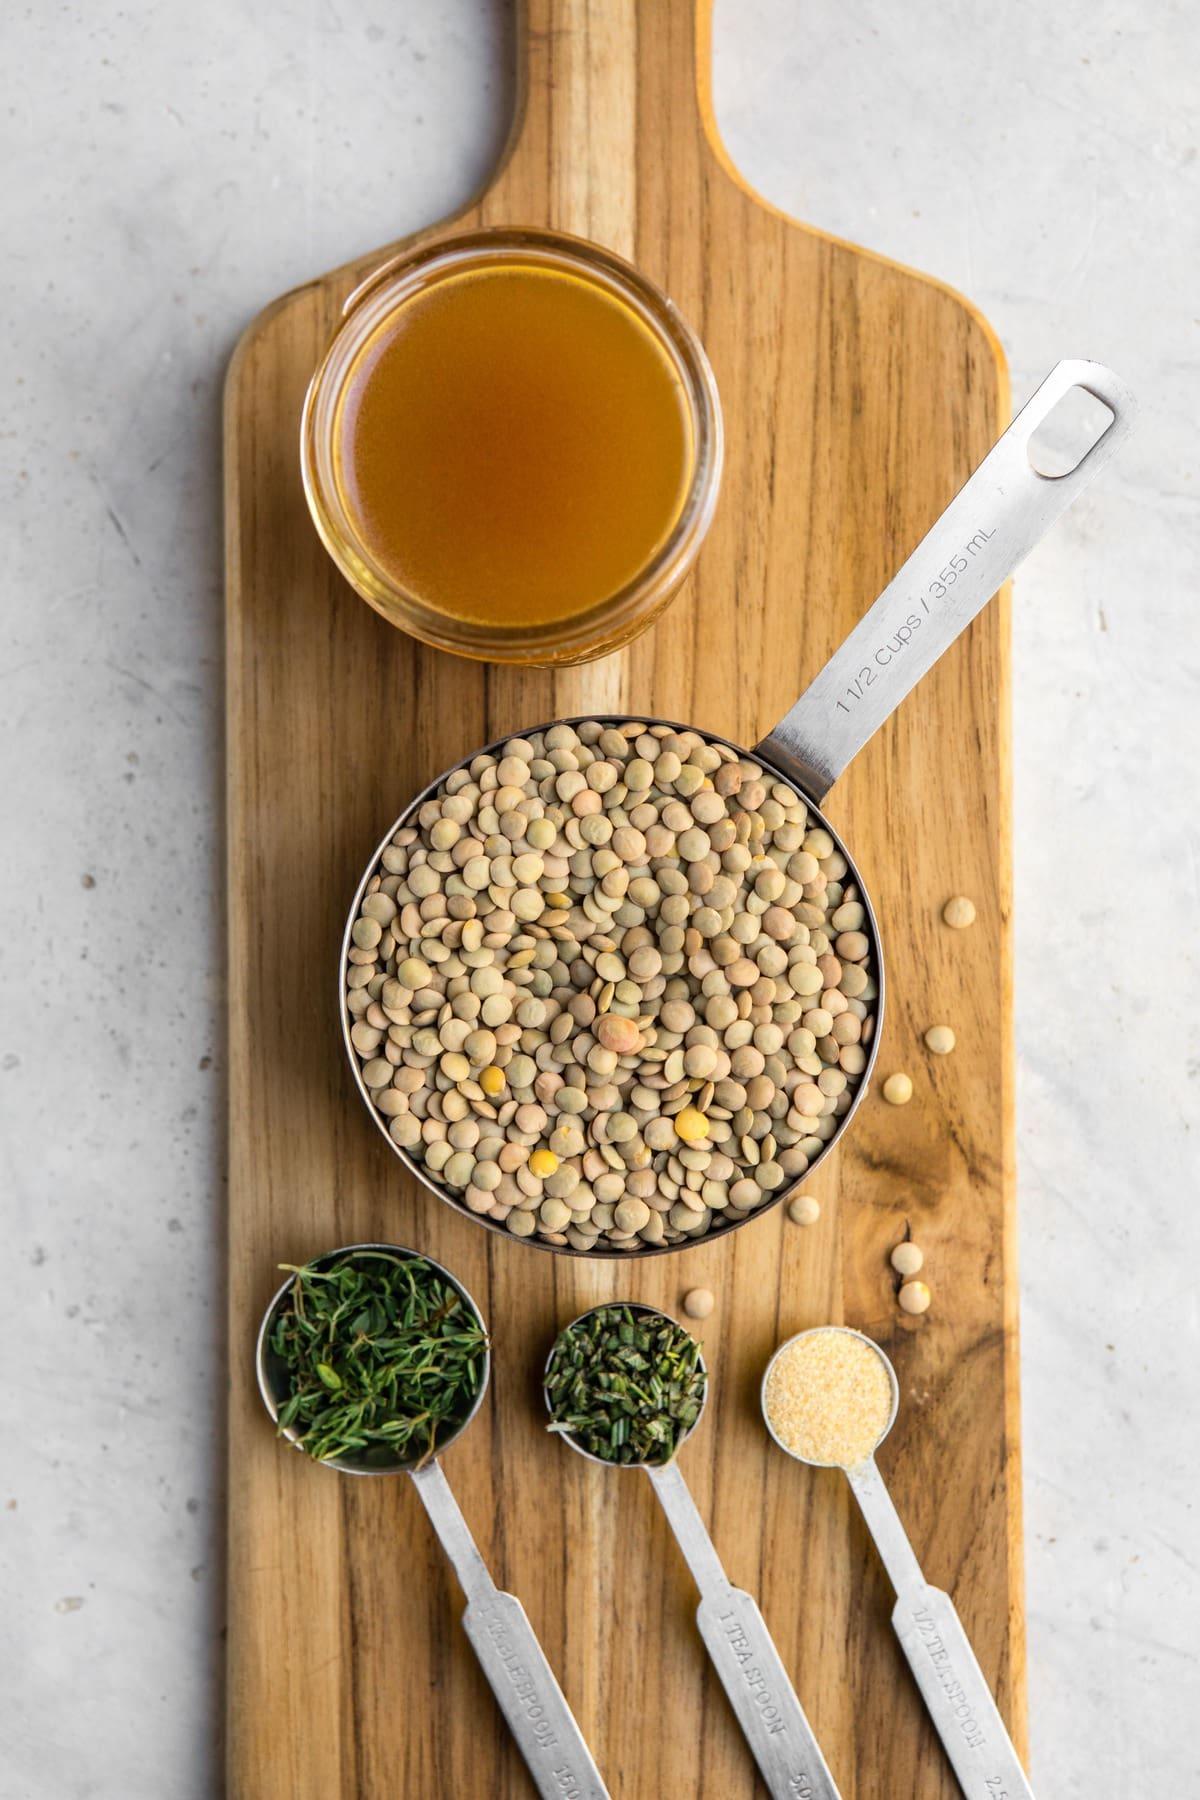 ingredients for rosemary garlic lentils on wood cutting board